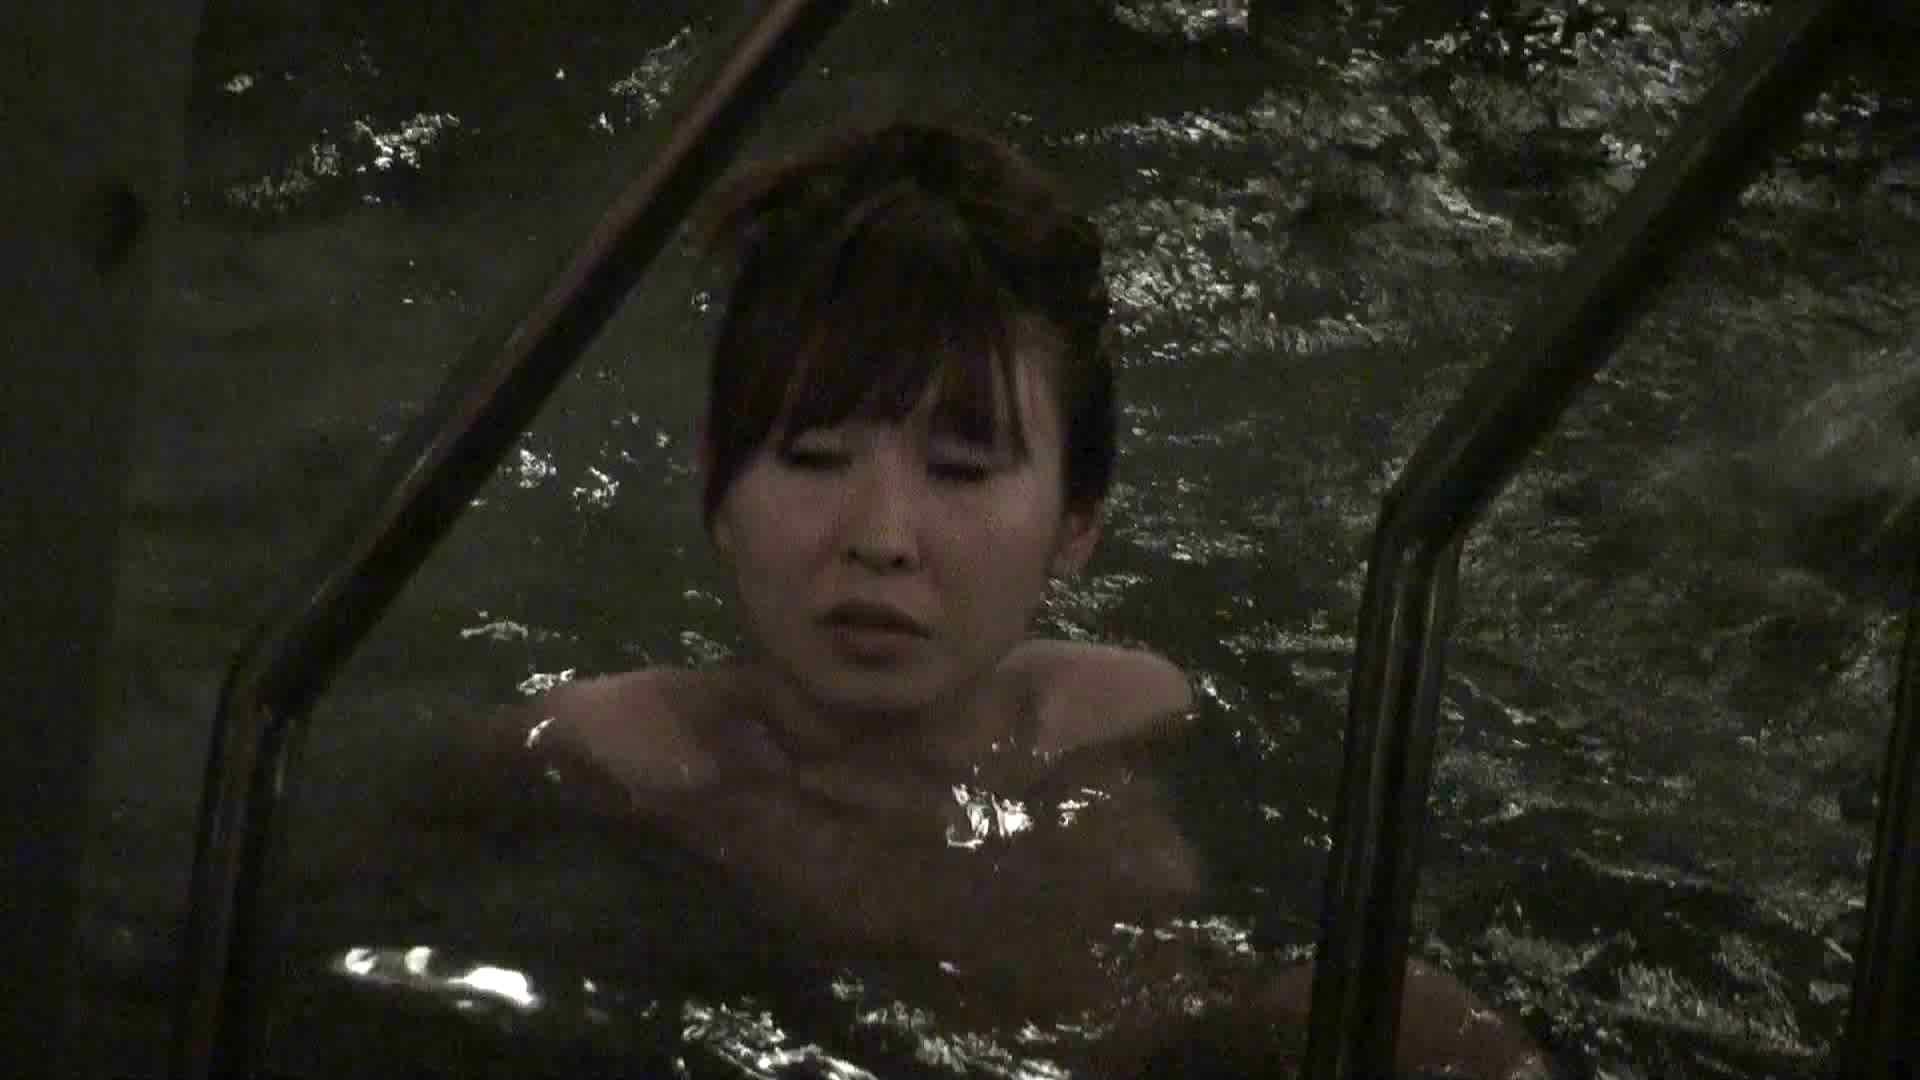 Aquaな露天風呂Vol.410 OLのプライベート オメコ動画キャプチャ 11pic 8